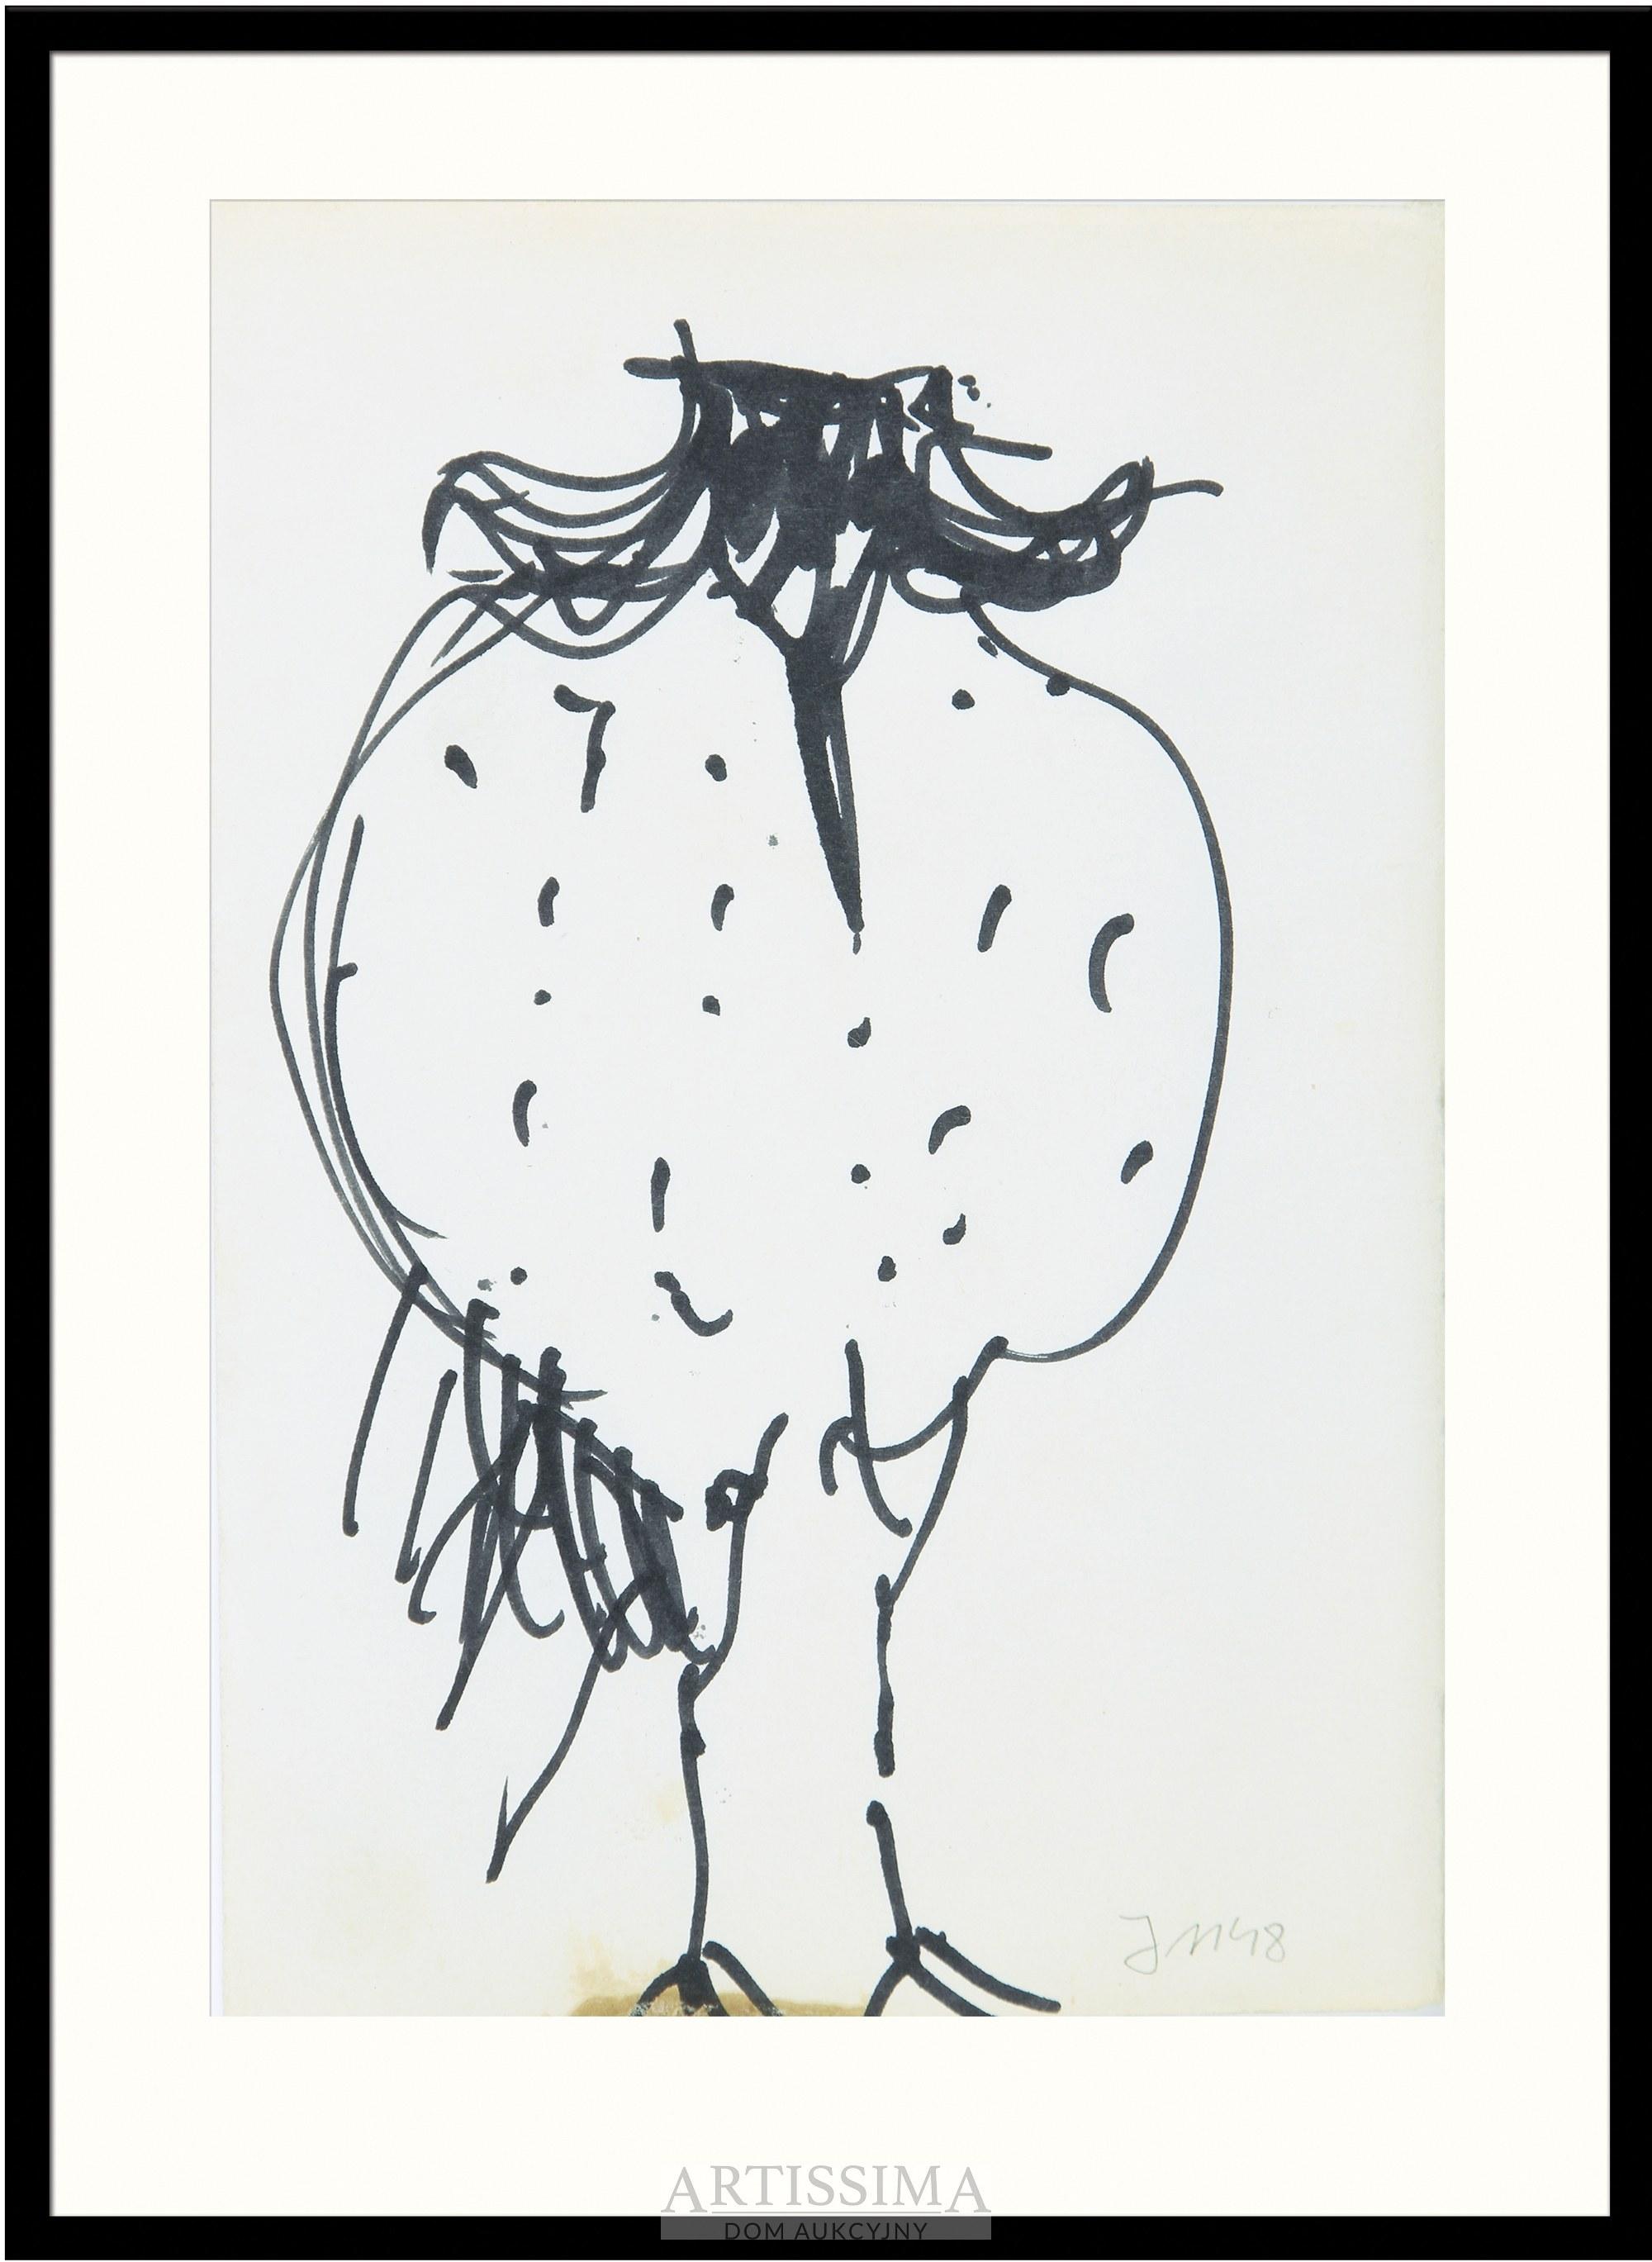 Barbara Jonscher (1926–1986), Puchaty ptak*